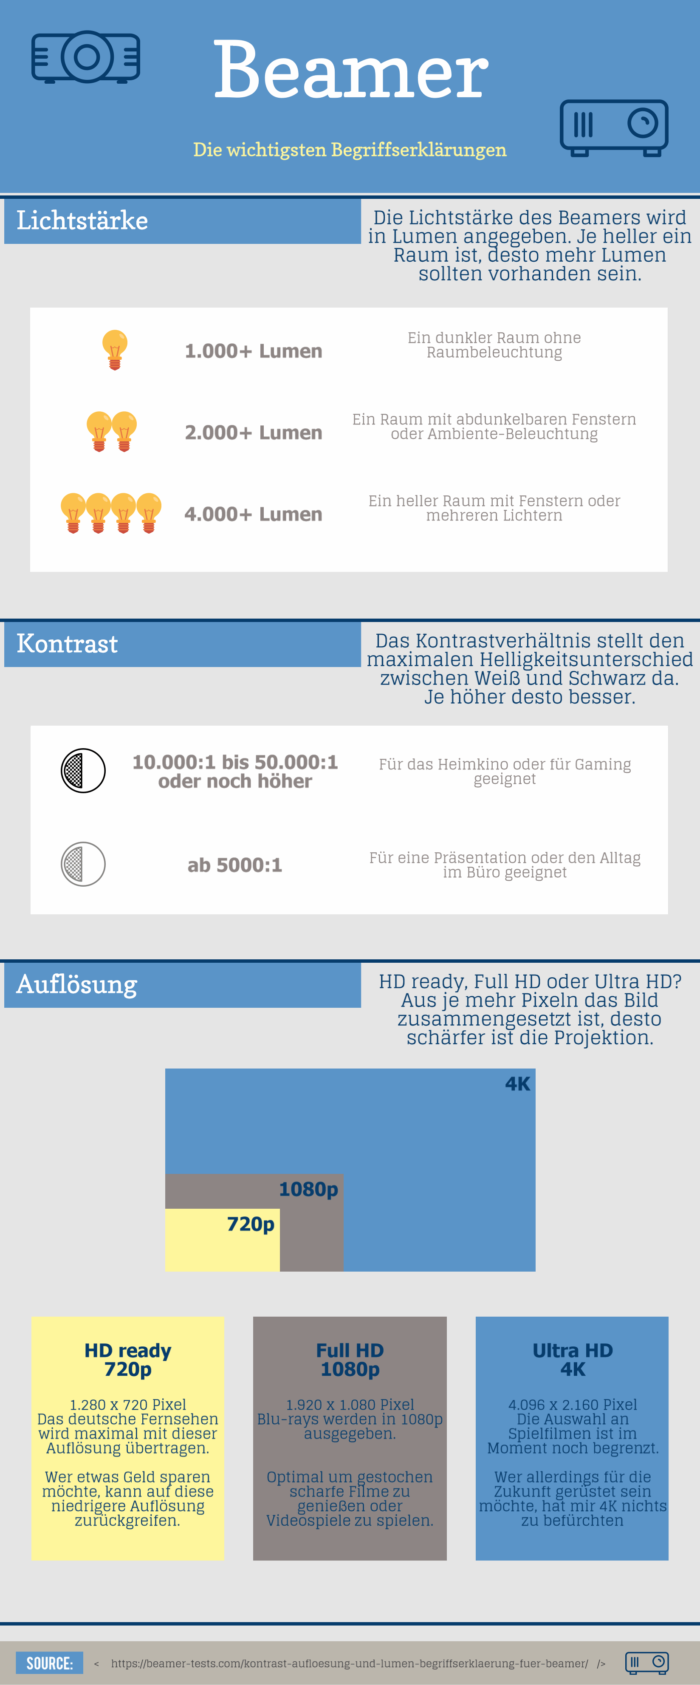 Beamer Infografik Lichtstärke Lumen Kontrast Auflösung